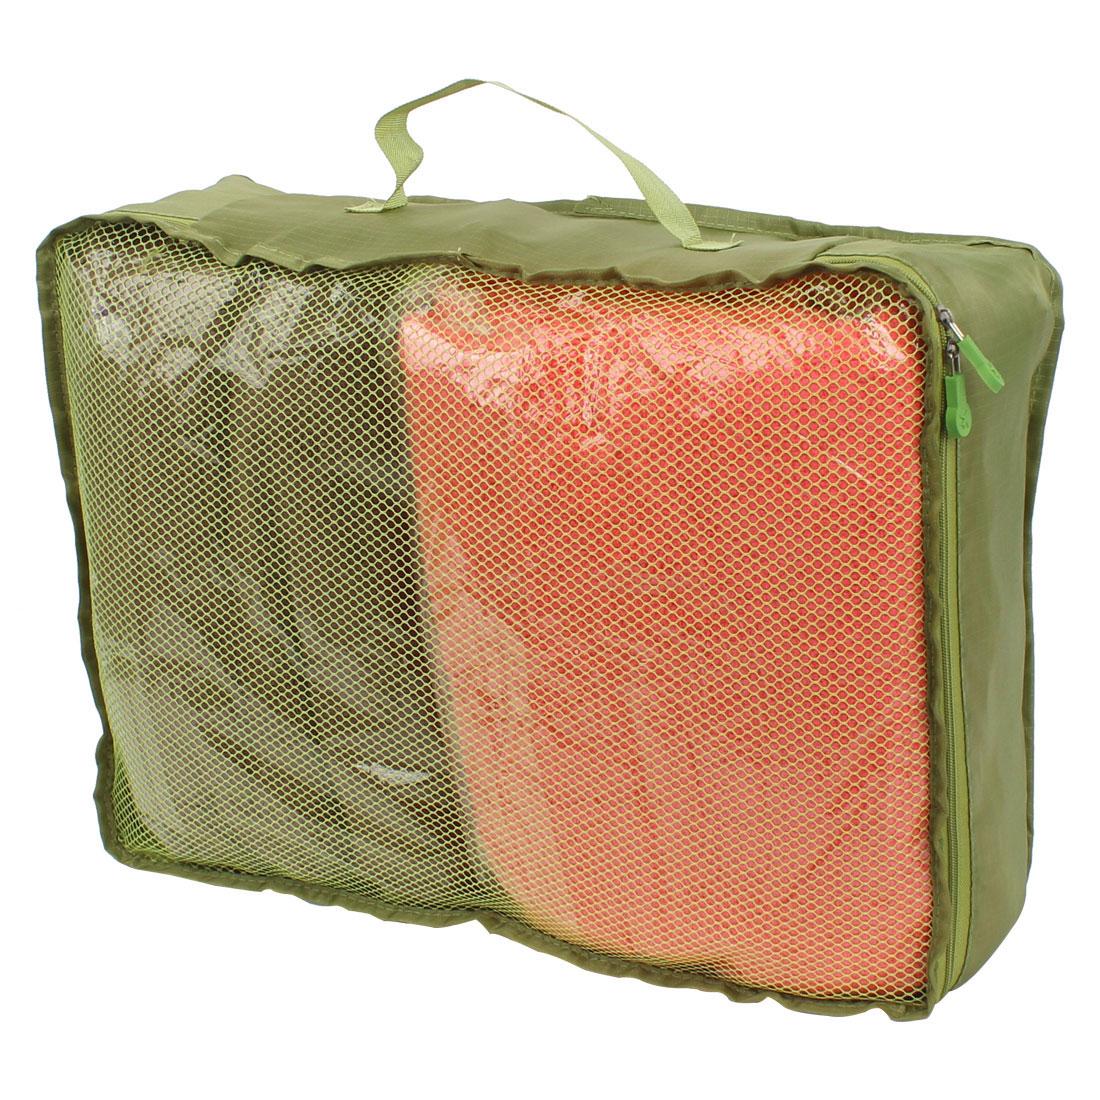 Green Portable Folding Underwear Bra Sock Clothes Organizer Storage Pouch Bag Handbag 40cm x 30cm x 13cm